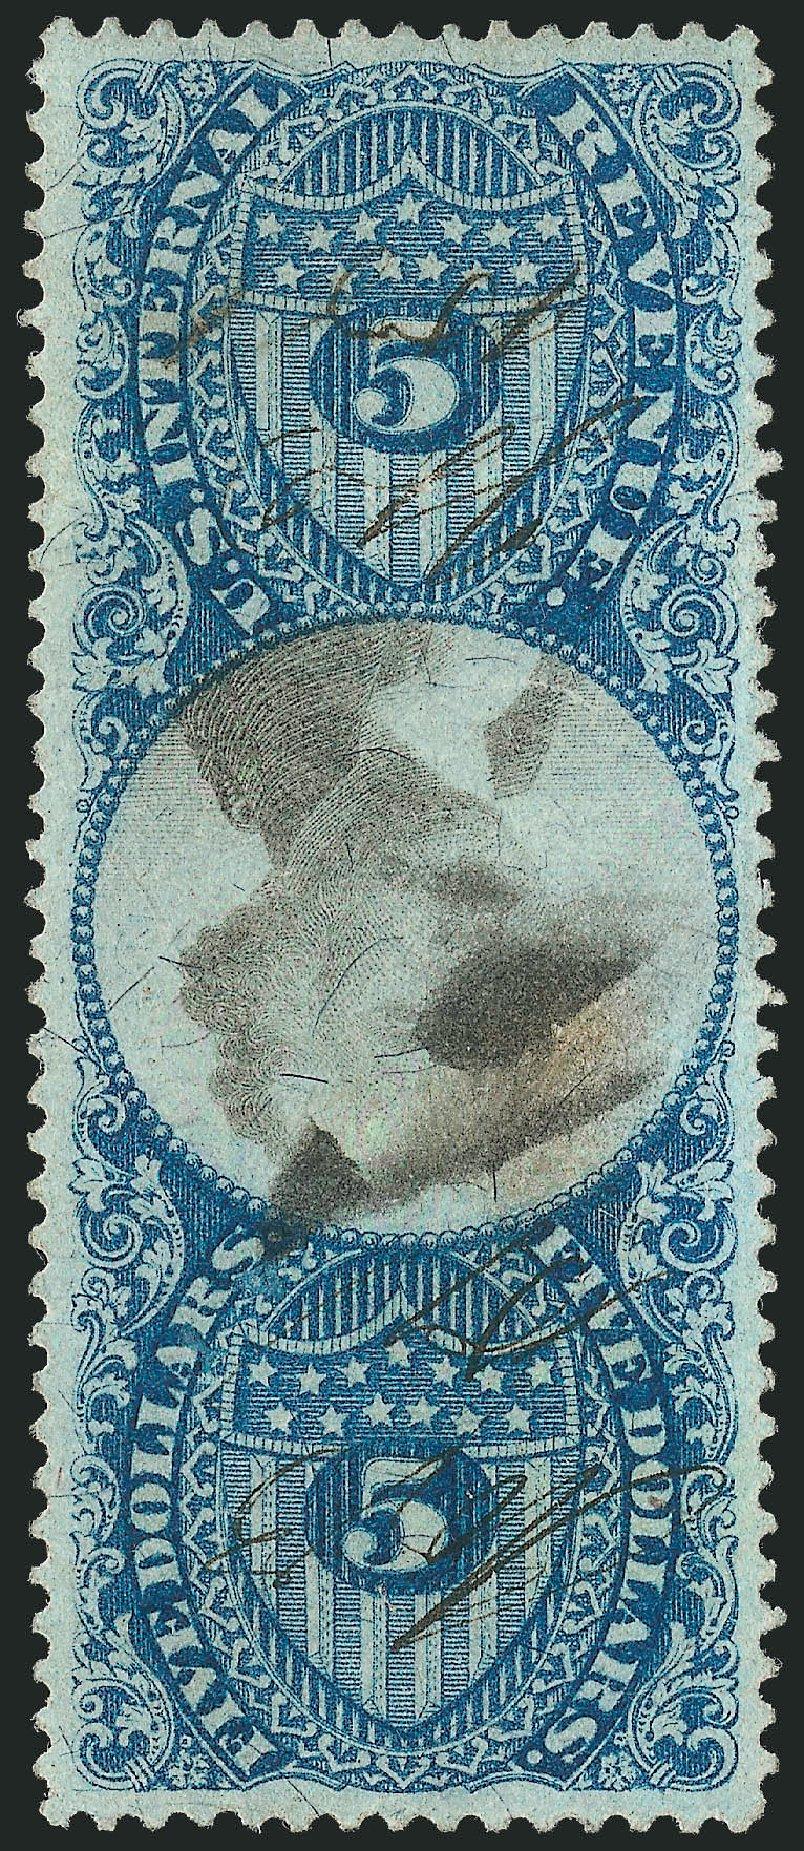 US Stamp Value Scott #R127: US$5.00 1871 Revenue Documentary . Robert Siegel Auction Galleries, Dec 2014, Sale 1089, Lot 490